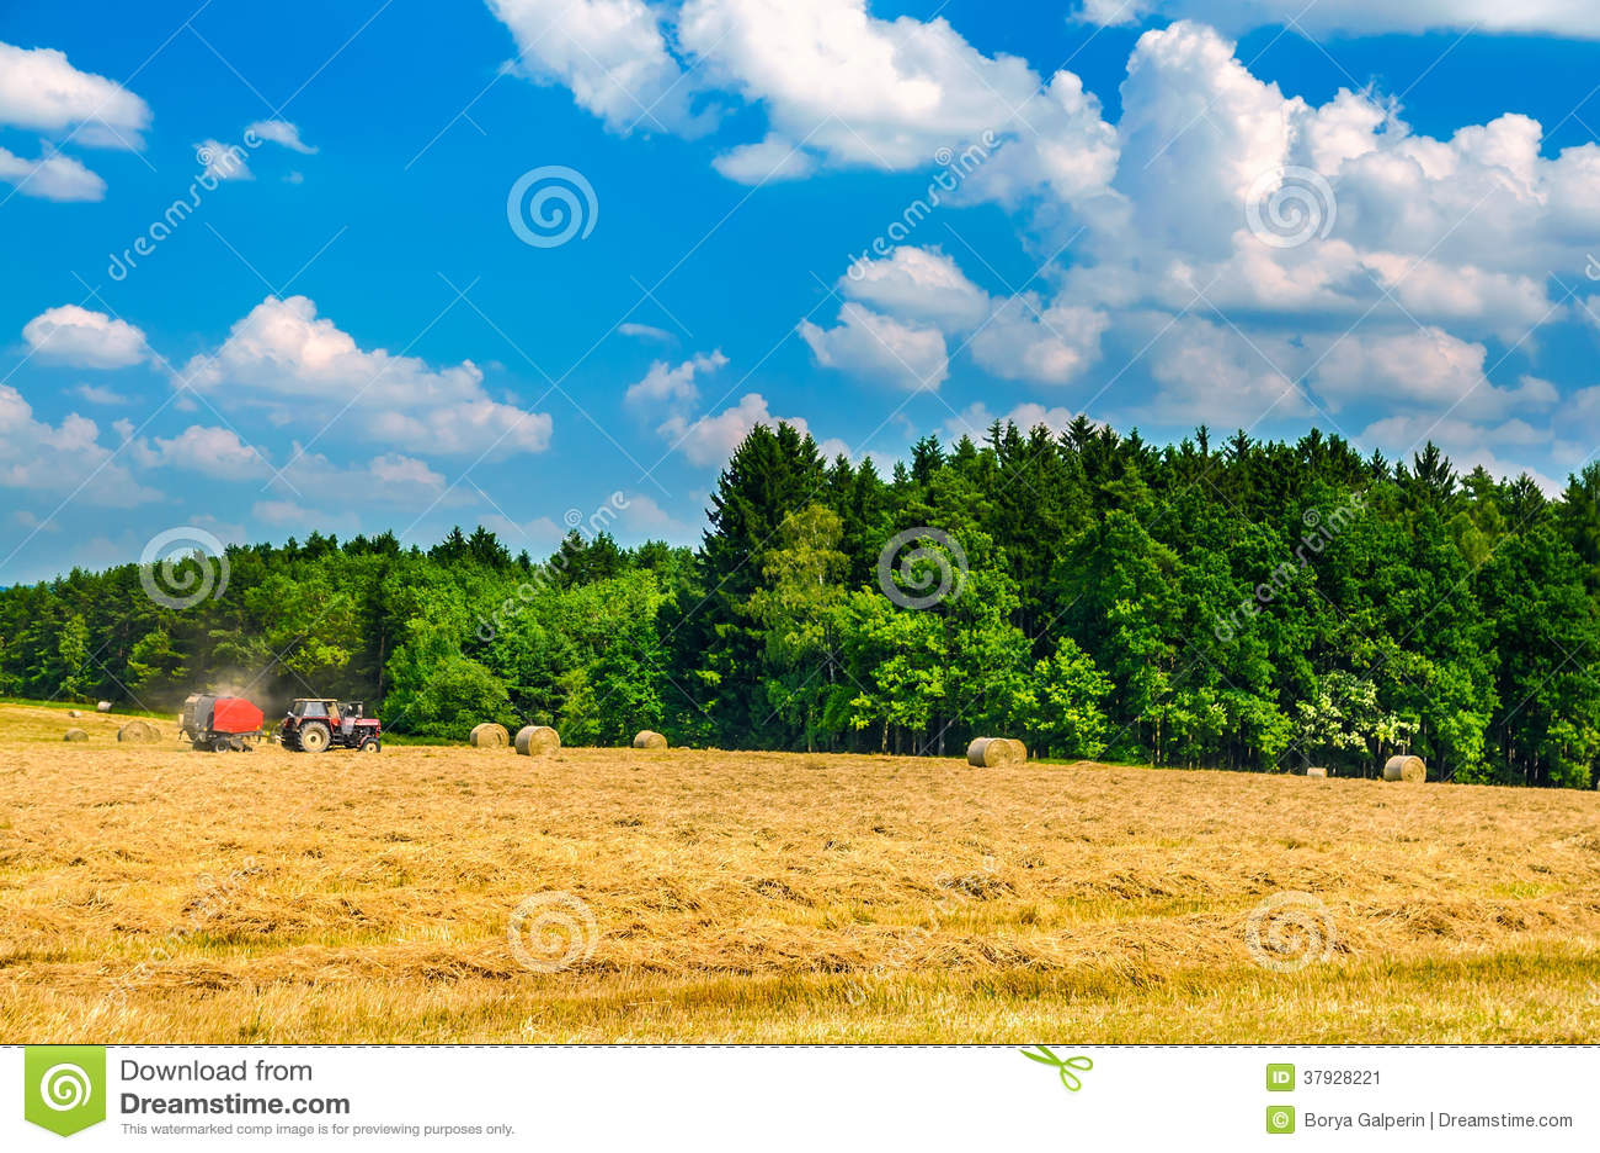 Tractor working in field